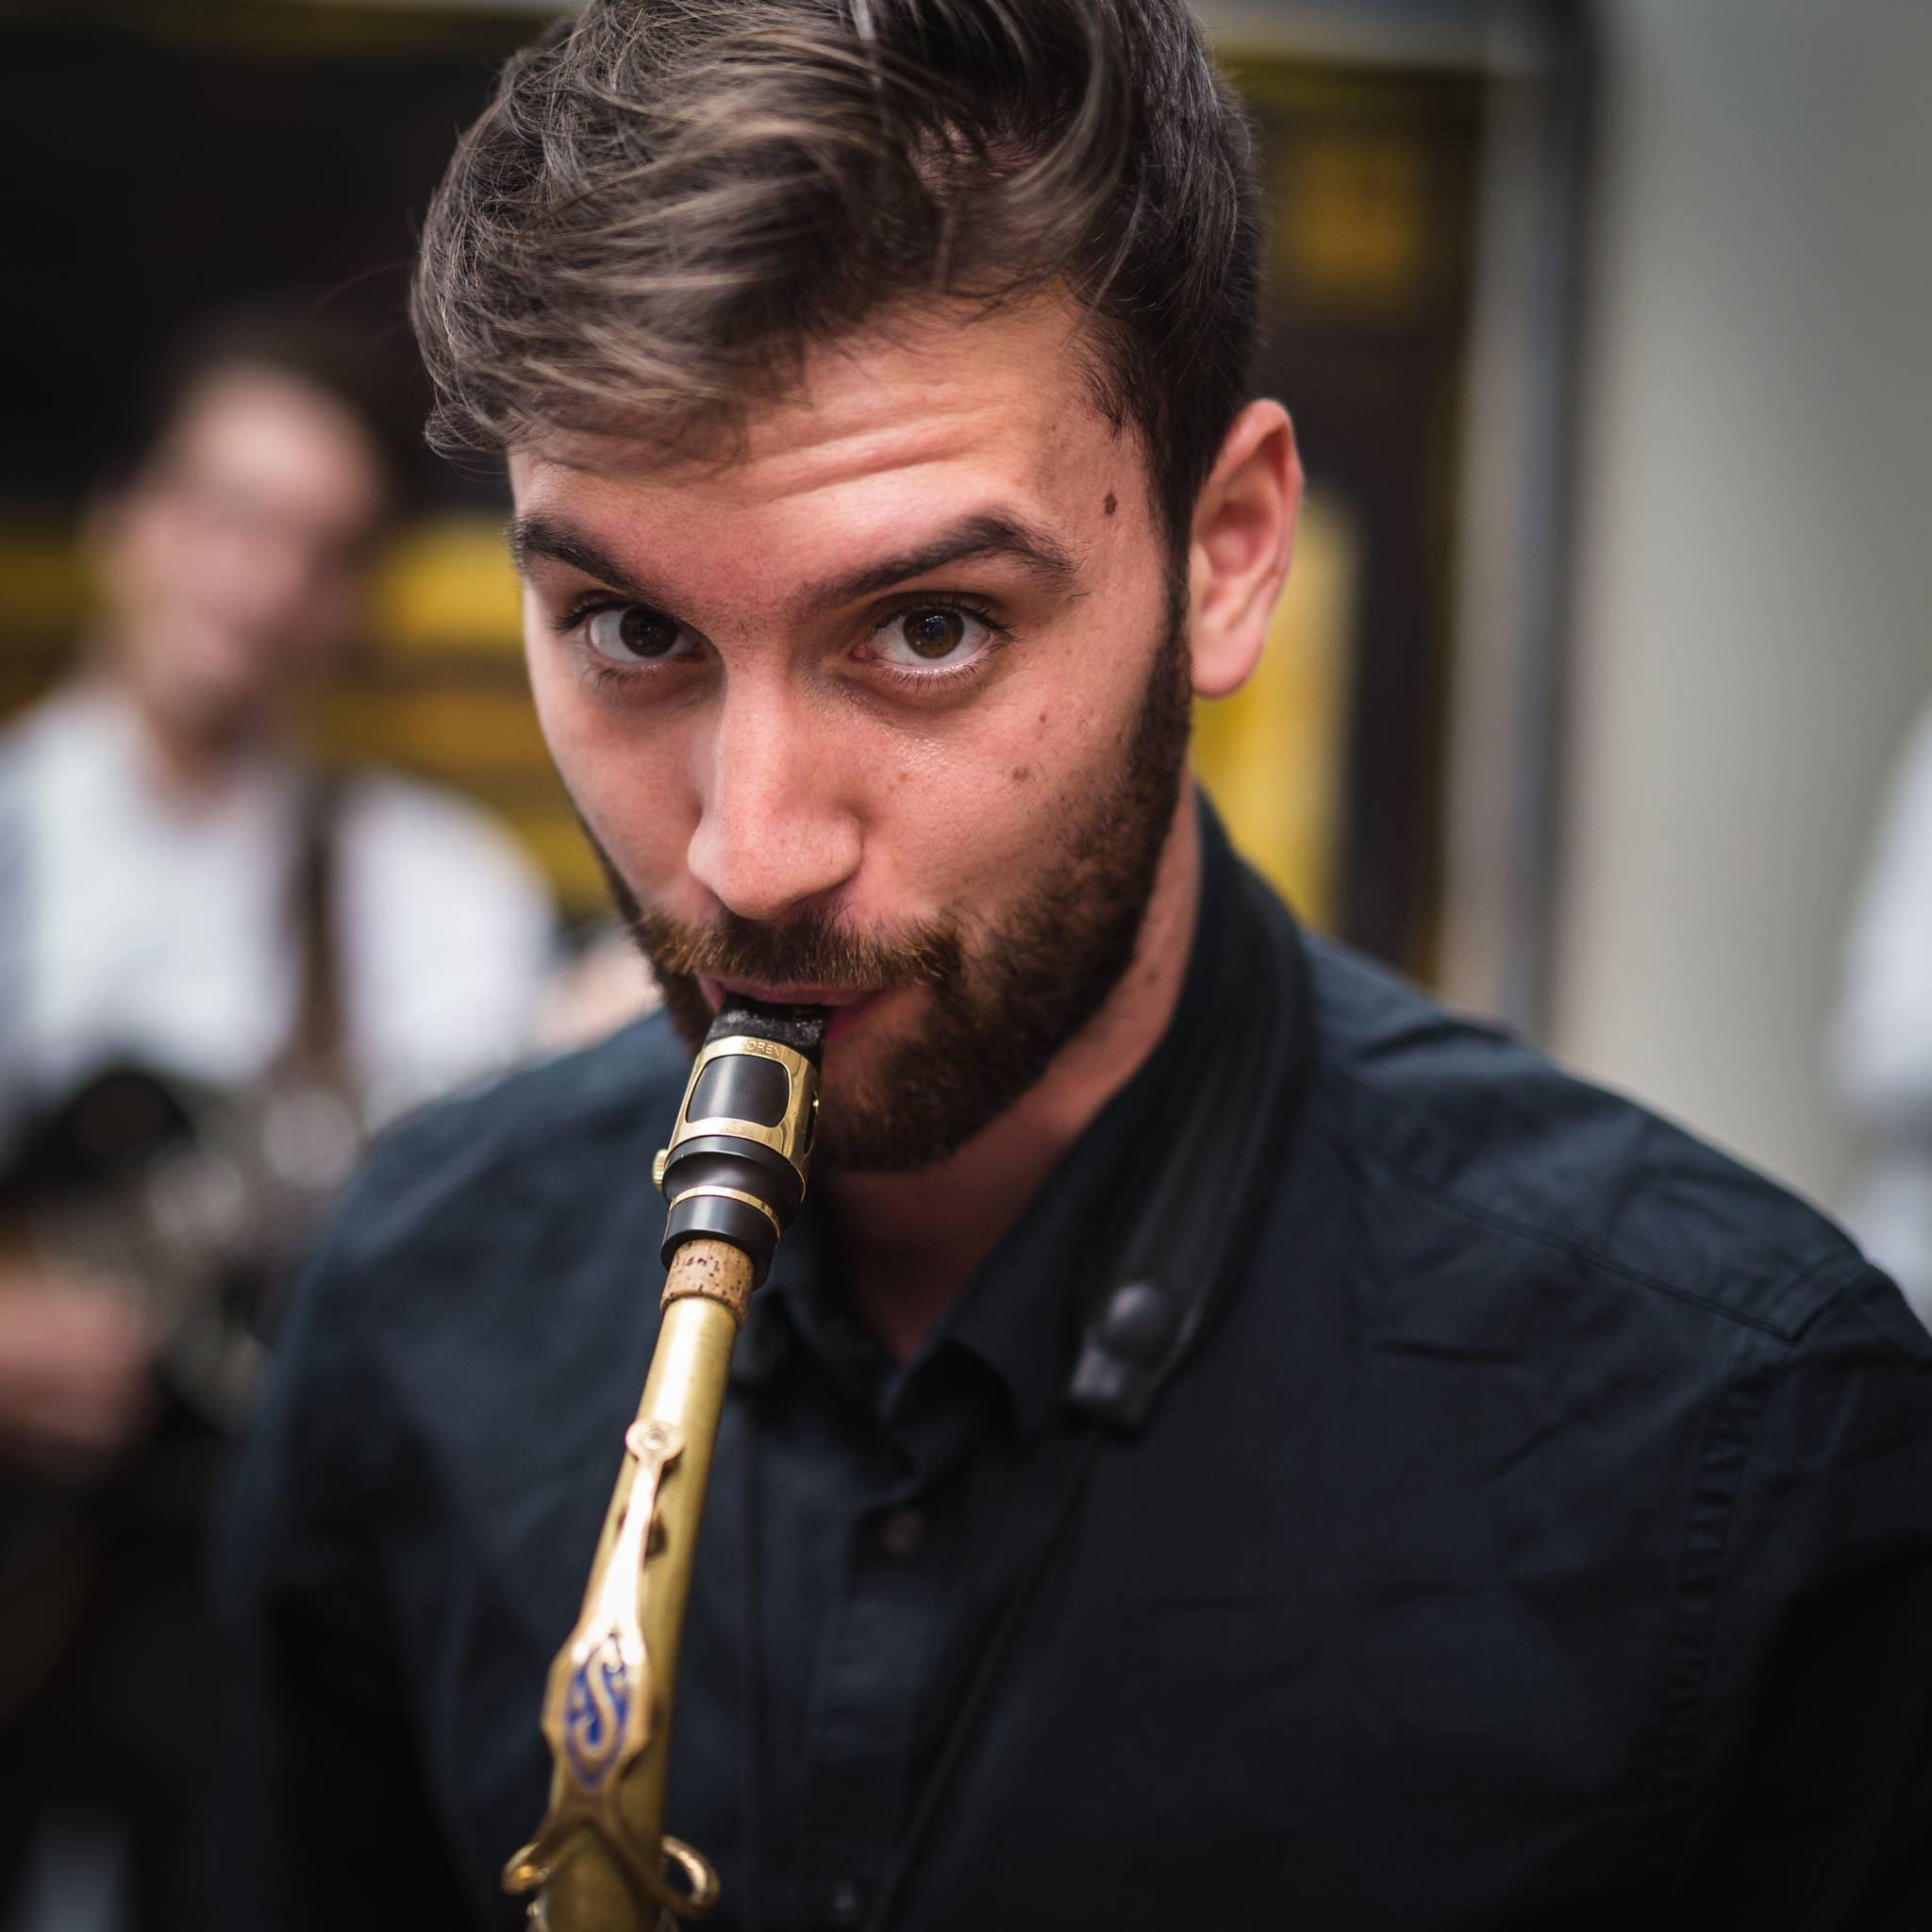 Hugo Afettouche, saxophone